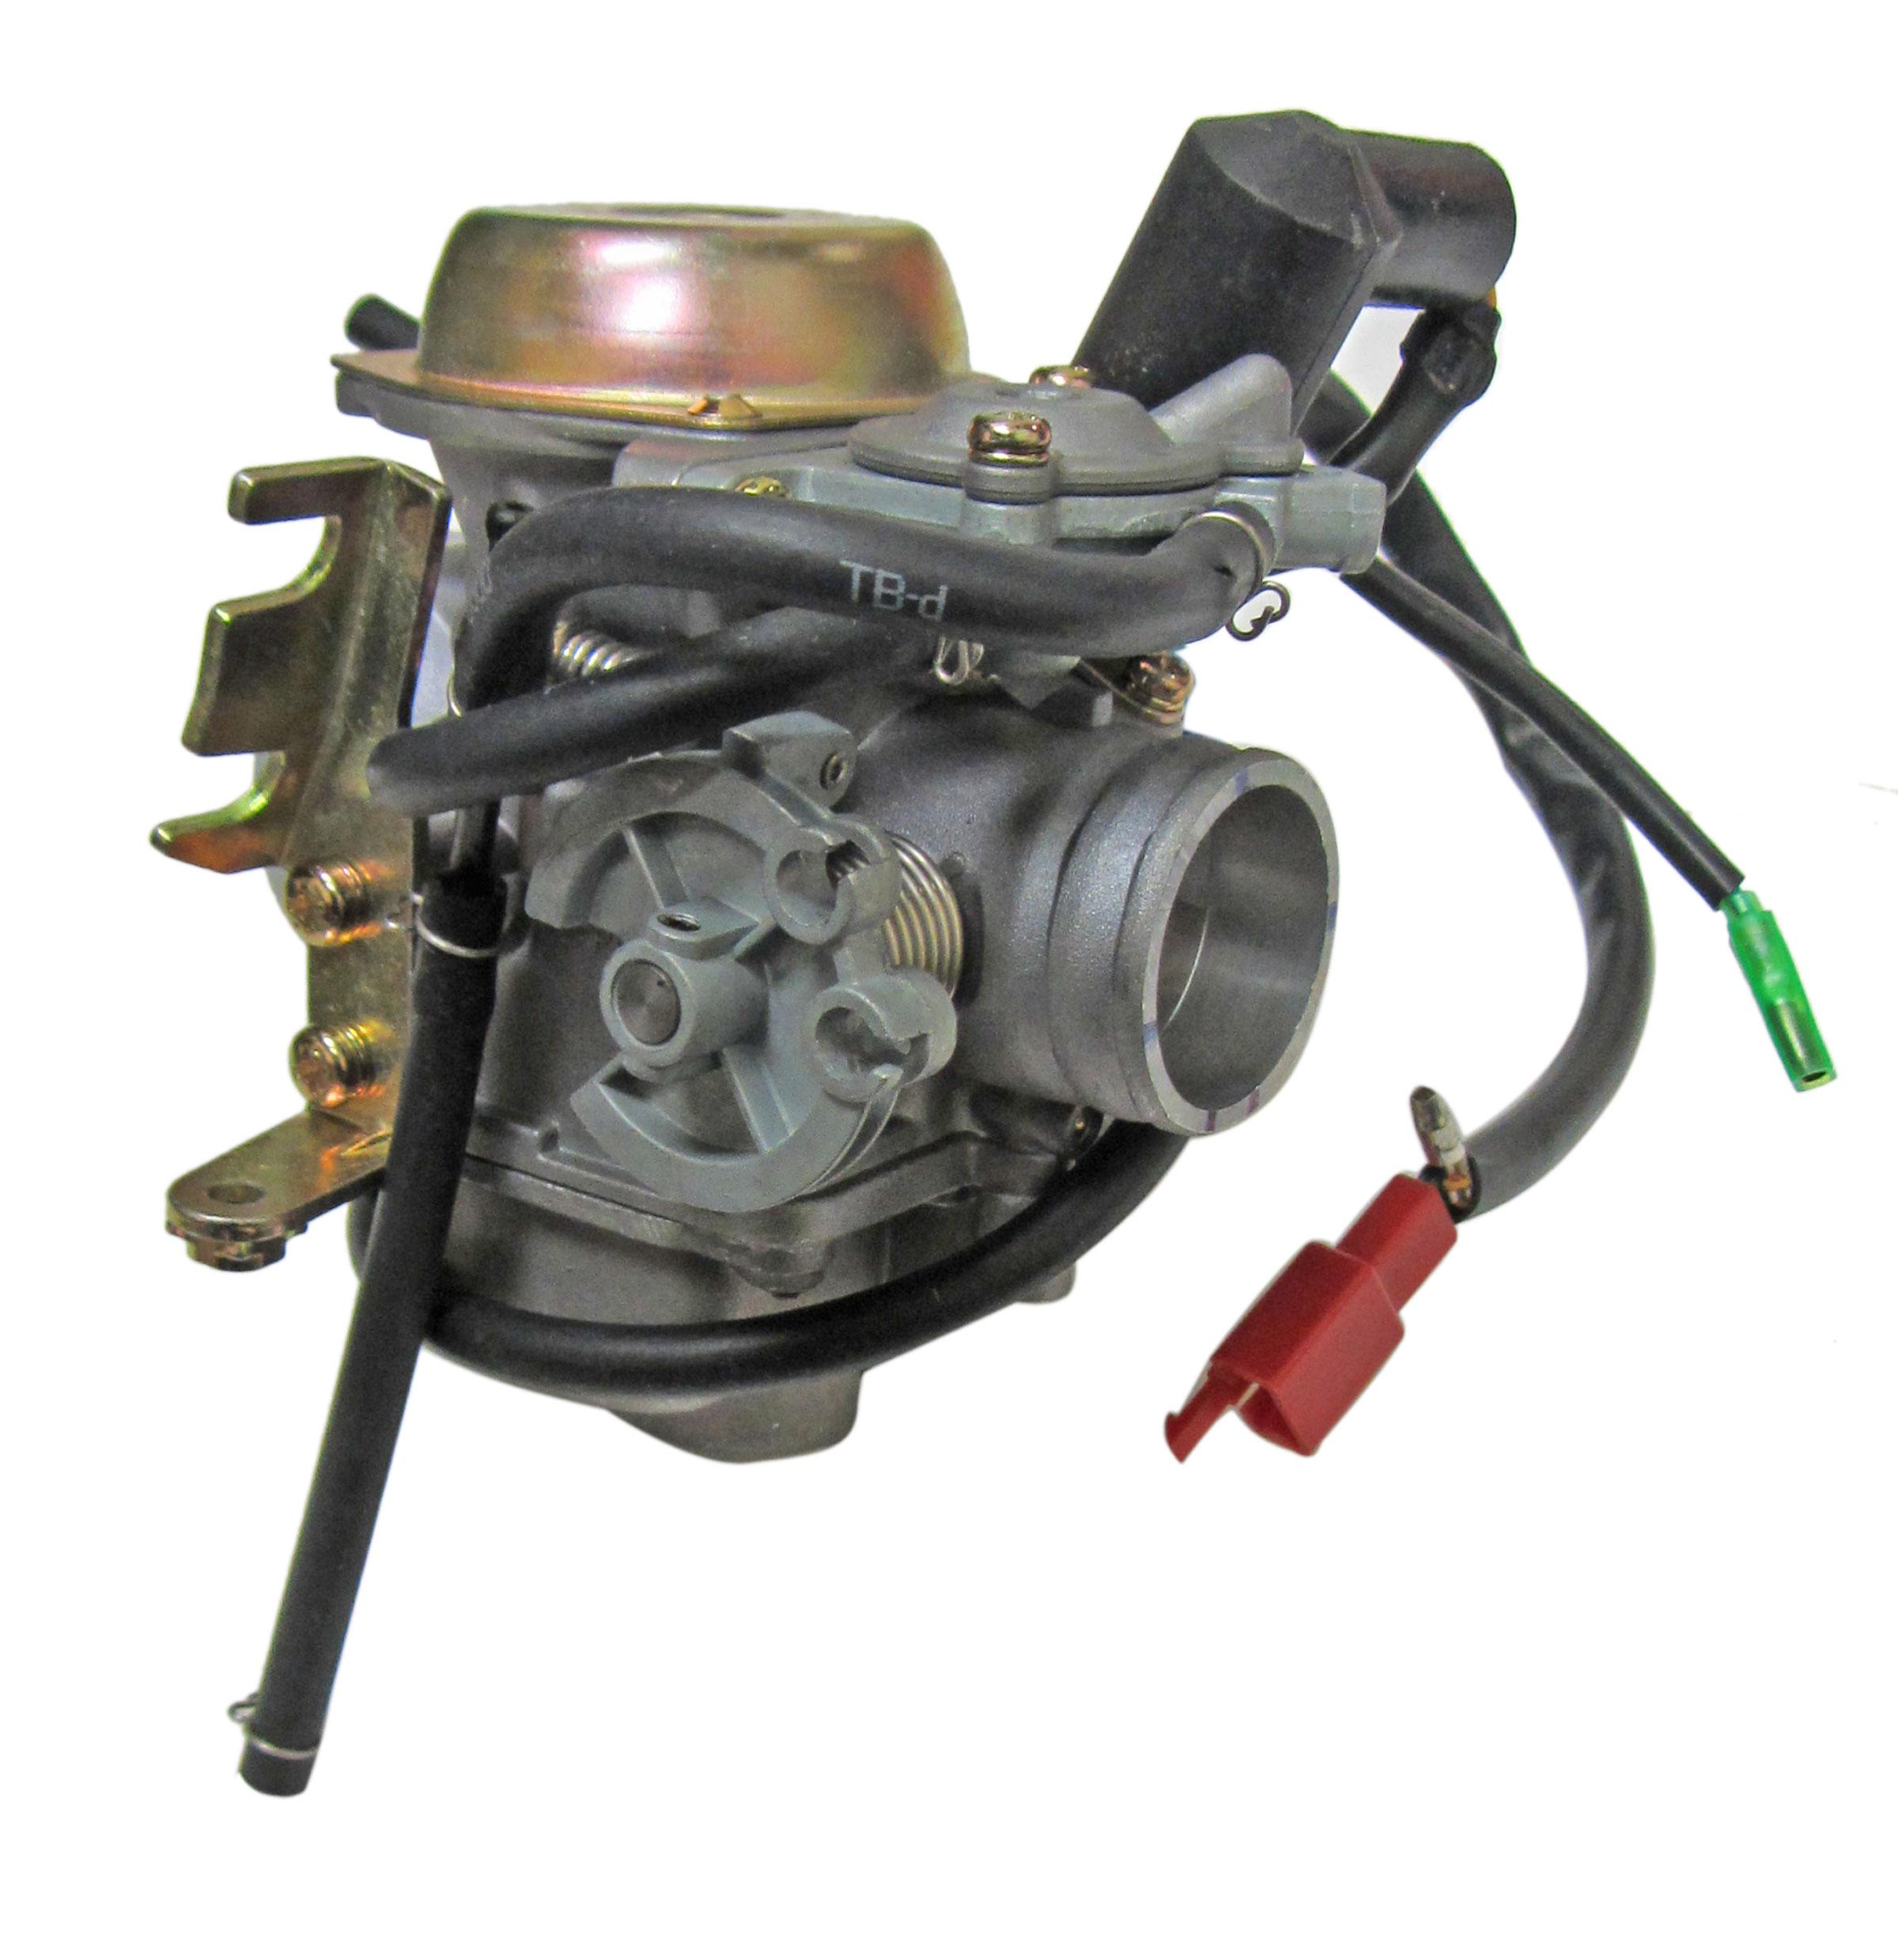 baja 250 engine diagram 250cc go kart carburetor for gy6    engine    640001 bmi  250cc go kart carburetor for gy6    engine    640001 bmi